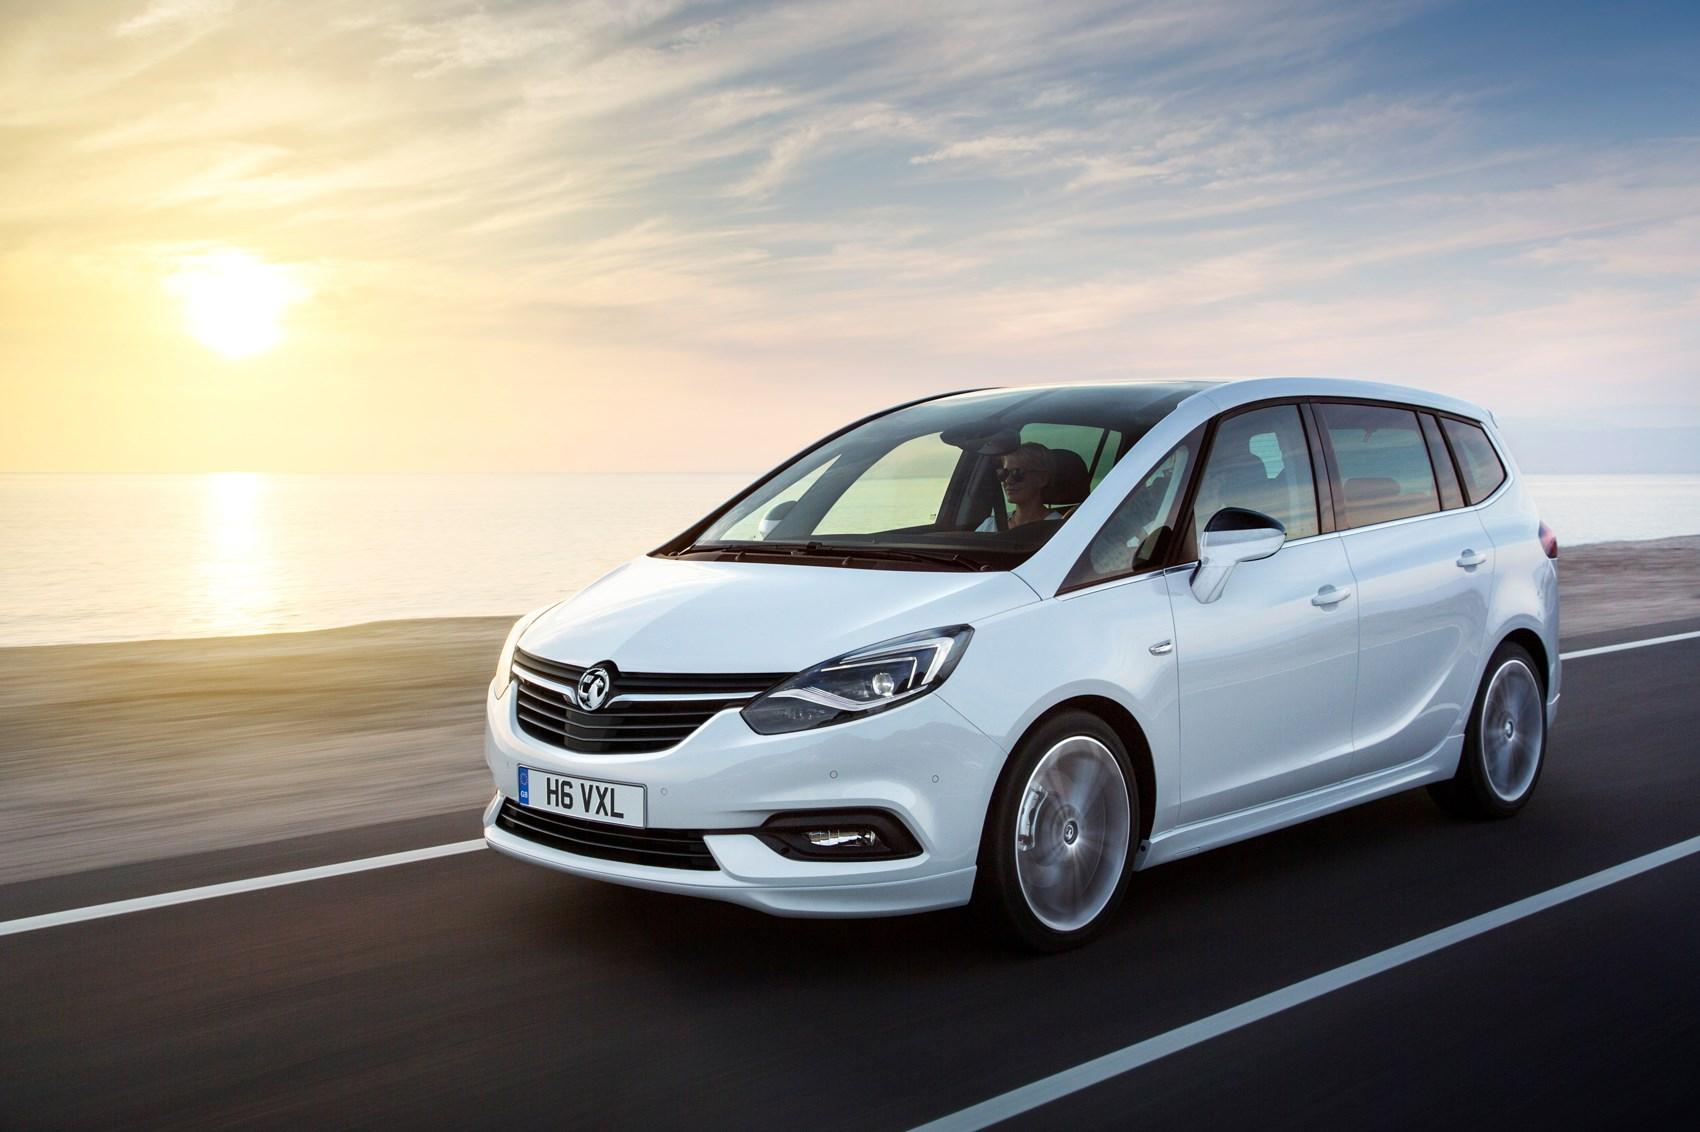 Opel Zafira C Restyling 2016 - now Minivan #5